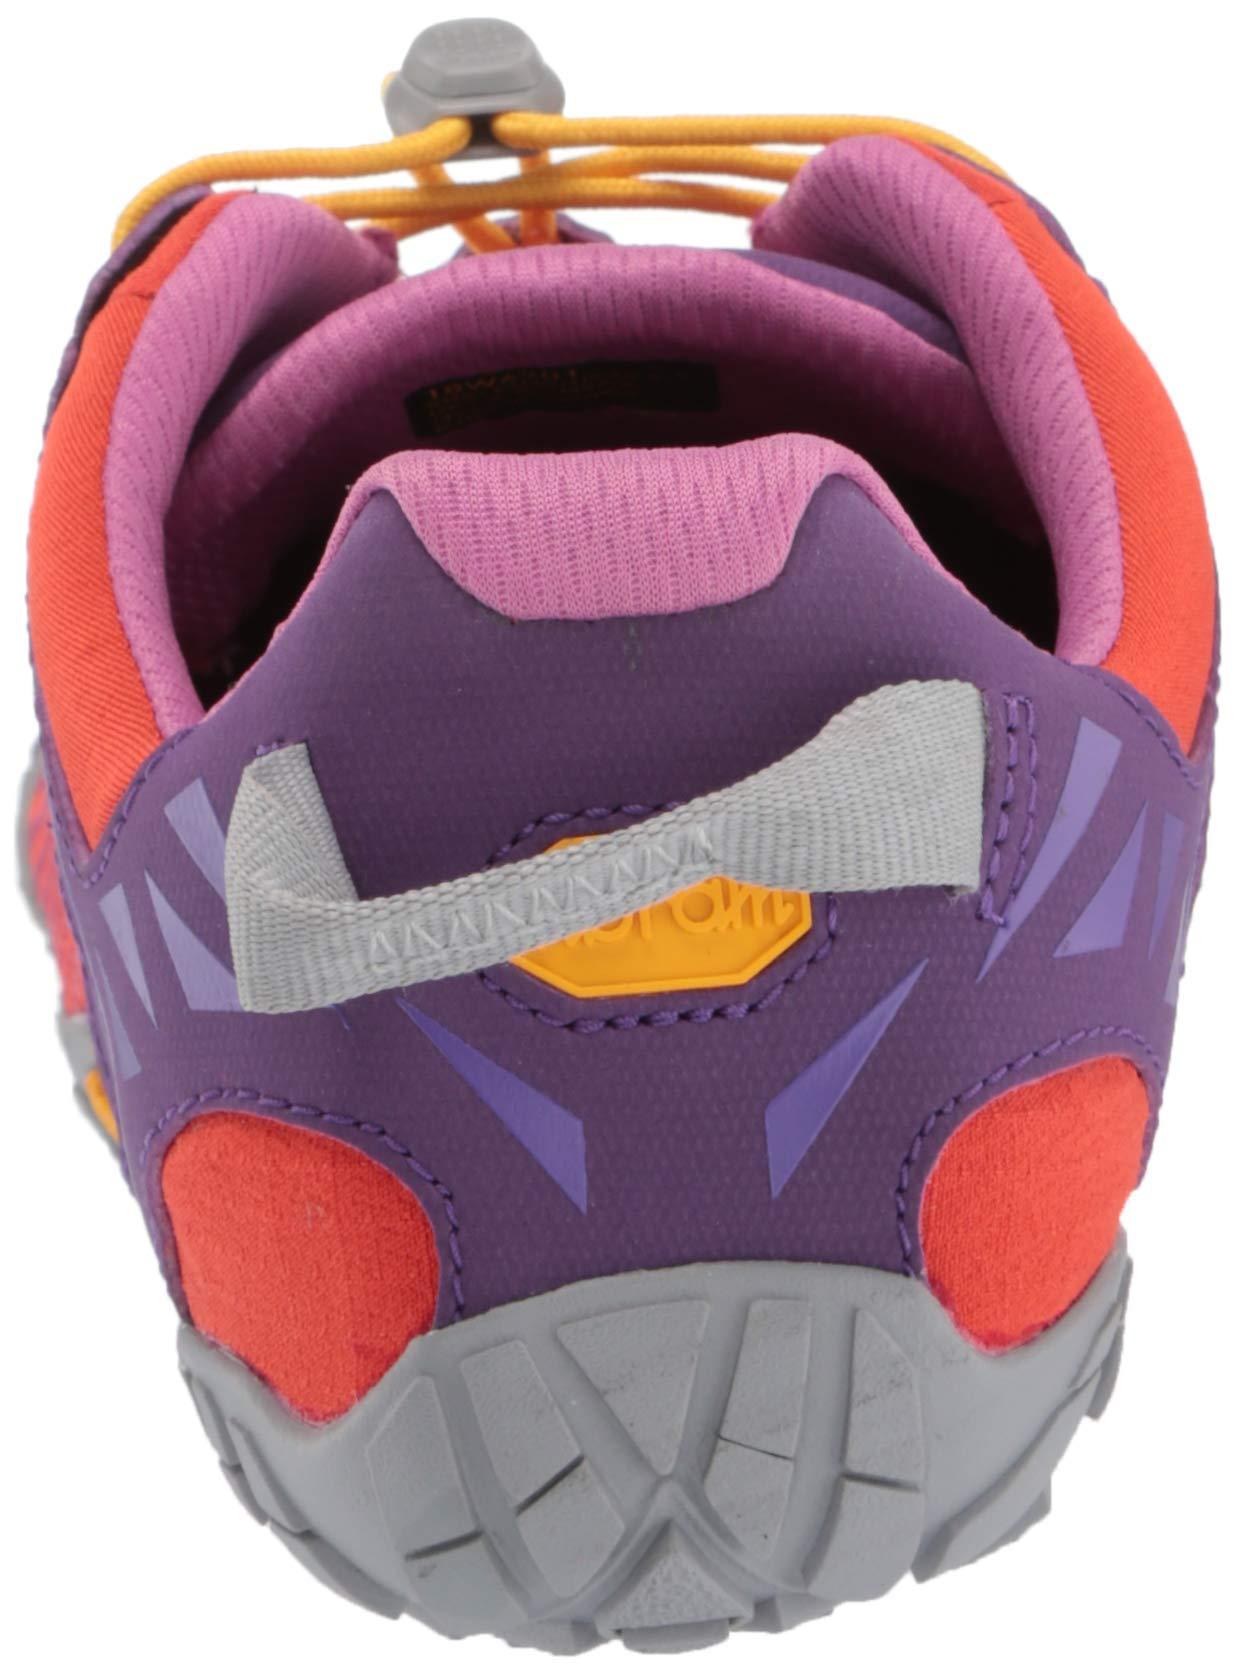 Vibram FiveFingers V-Trail, Women's Trail Running Shoes, Orange (Magenta/Orange), 7.5-8 UK (41 EU) by Vibram (Image #4)